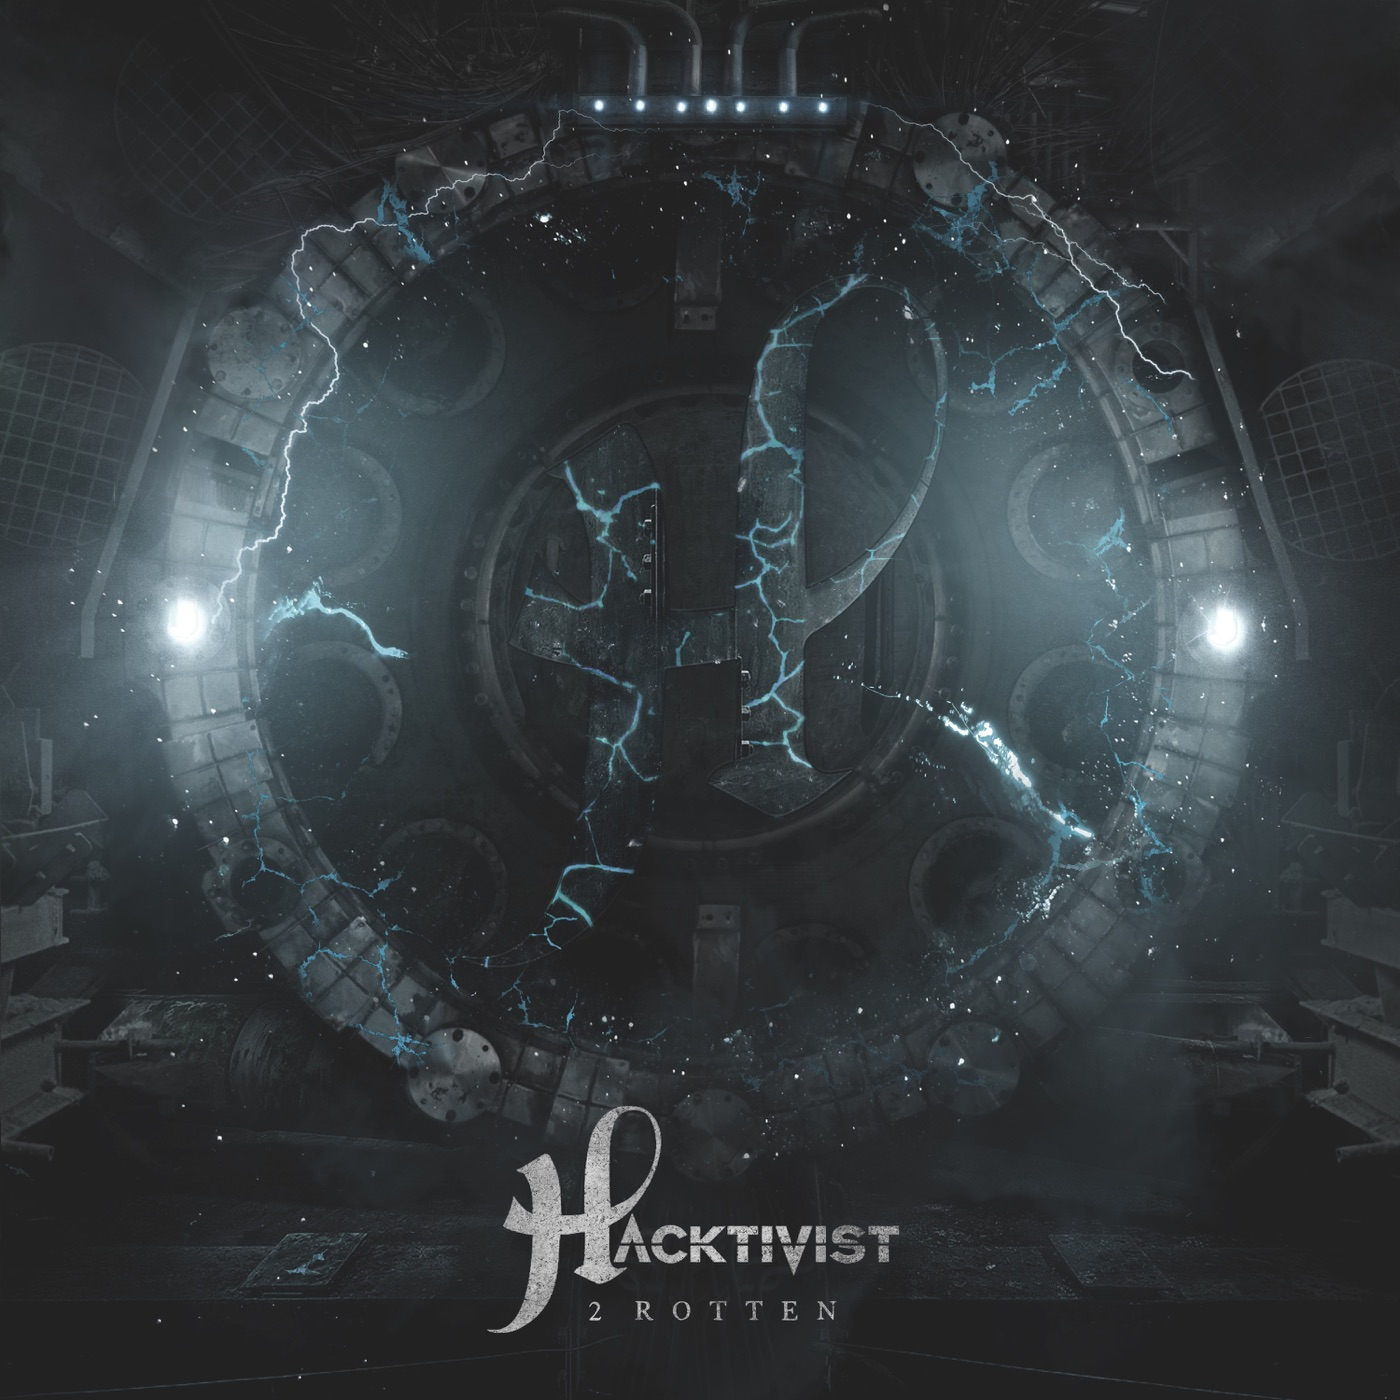 Hacktivist - 2 Rotten [single] (2017)